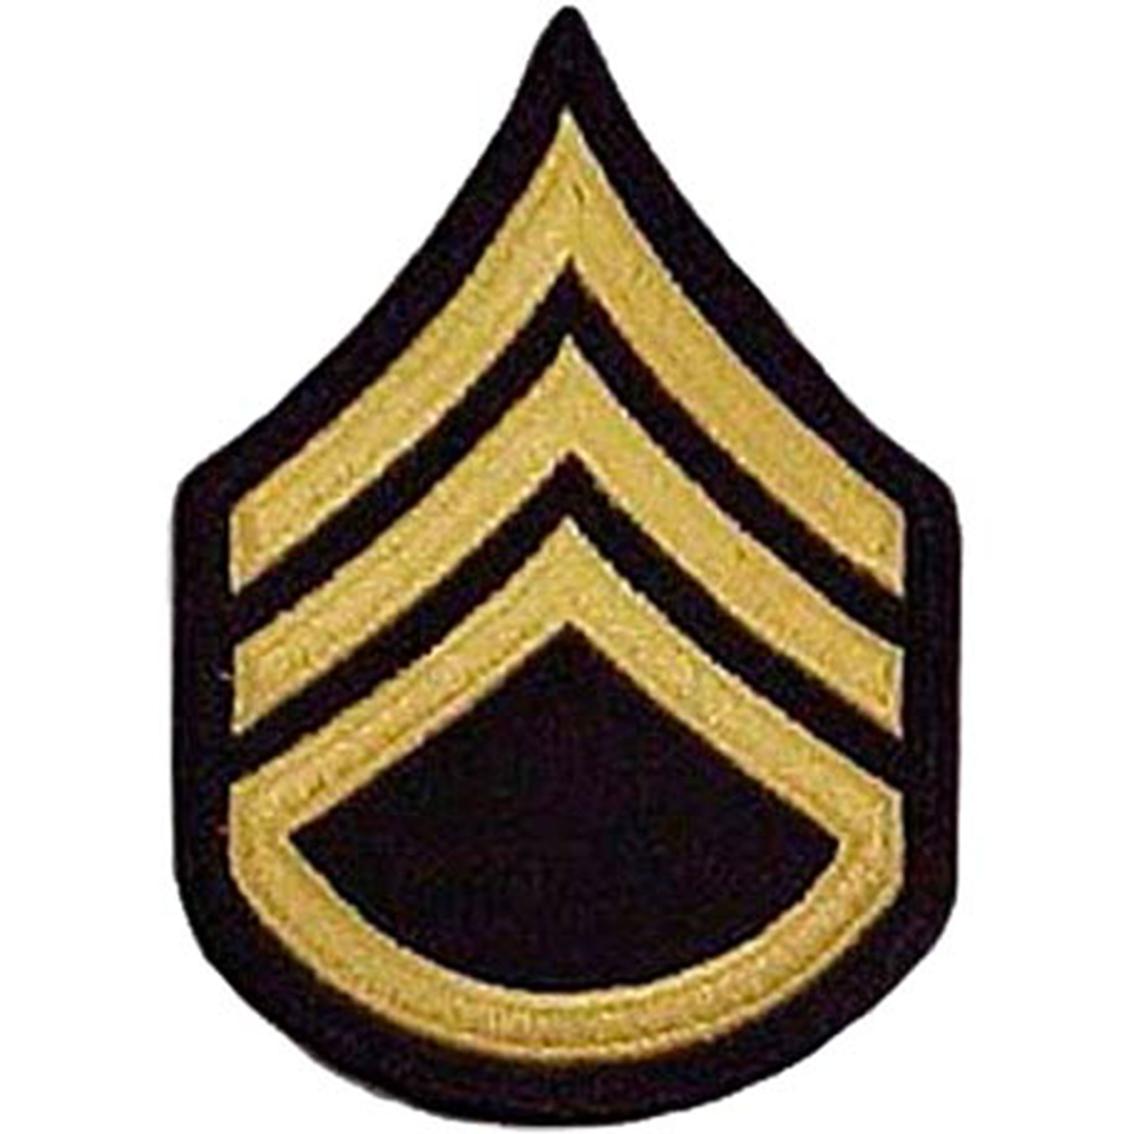 Army Rank Ssg Small Asu Sew-on | Small Asu Rank | Military | Shop The